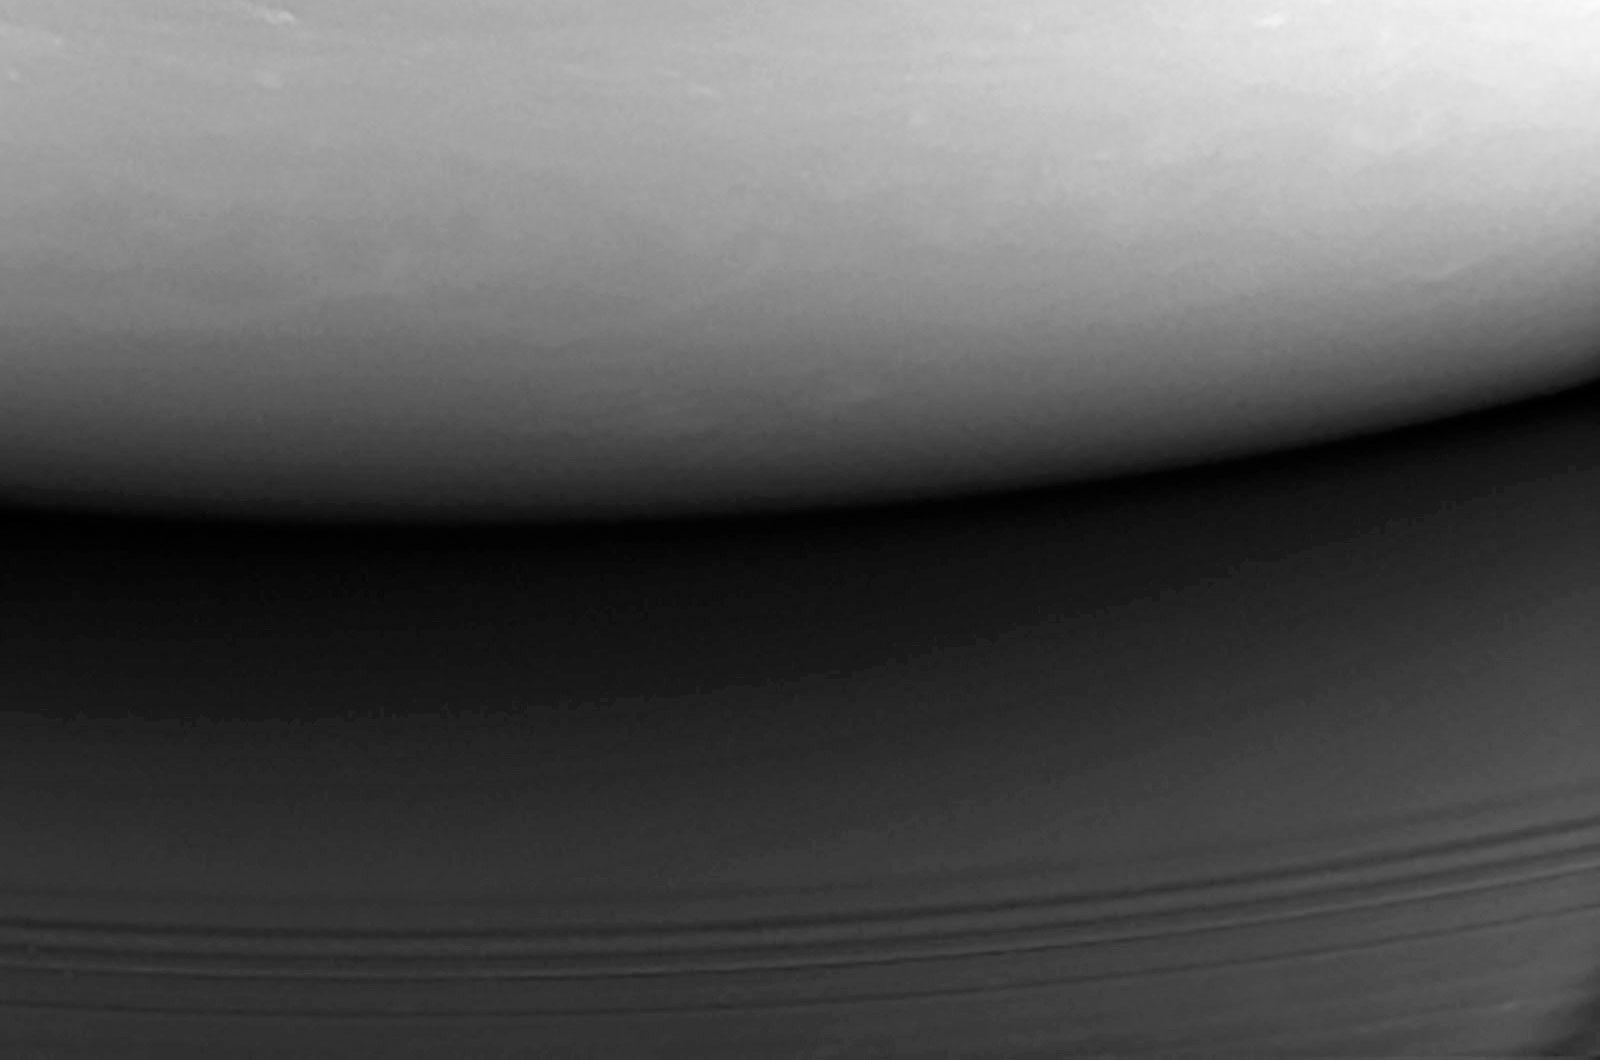 Cassini's final image of Saturn shows its crash site.